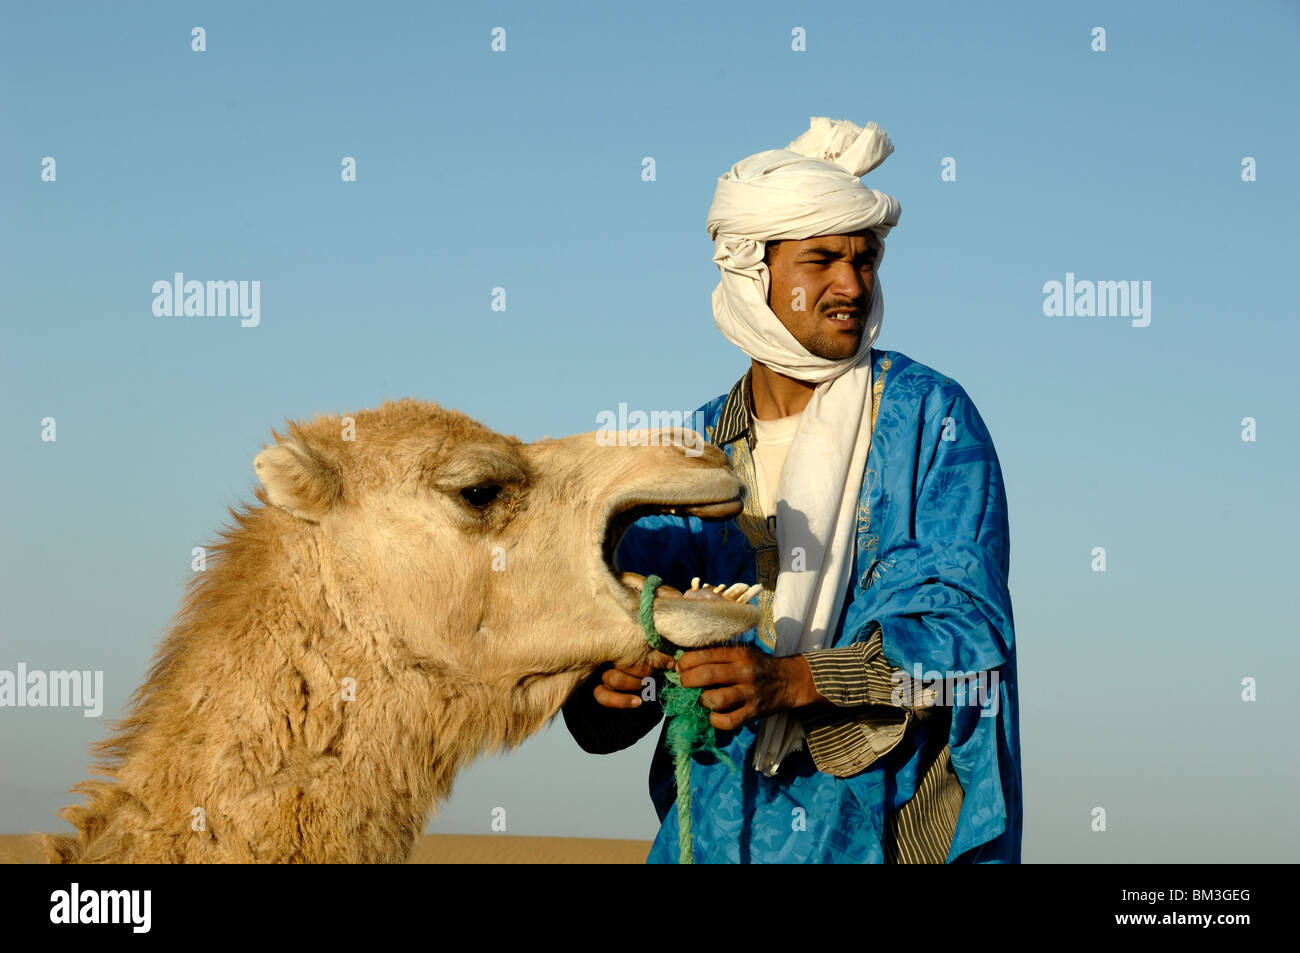 Berber in Blue Tunic & White Head-dress Preparing Camel or Dromedary for Desert Camel Ride near Zagora, Sahara - Stock Image